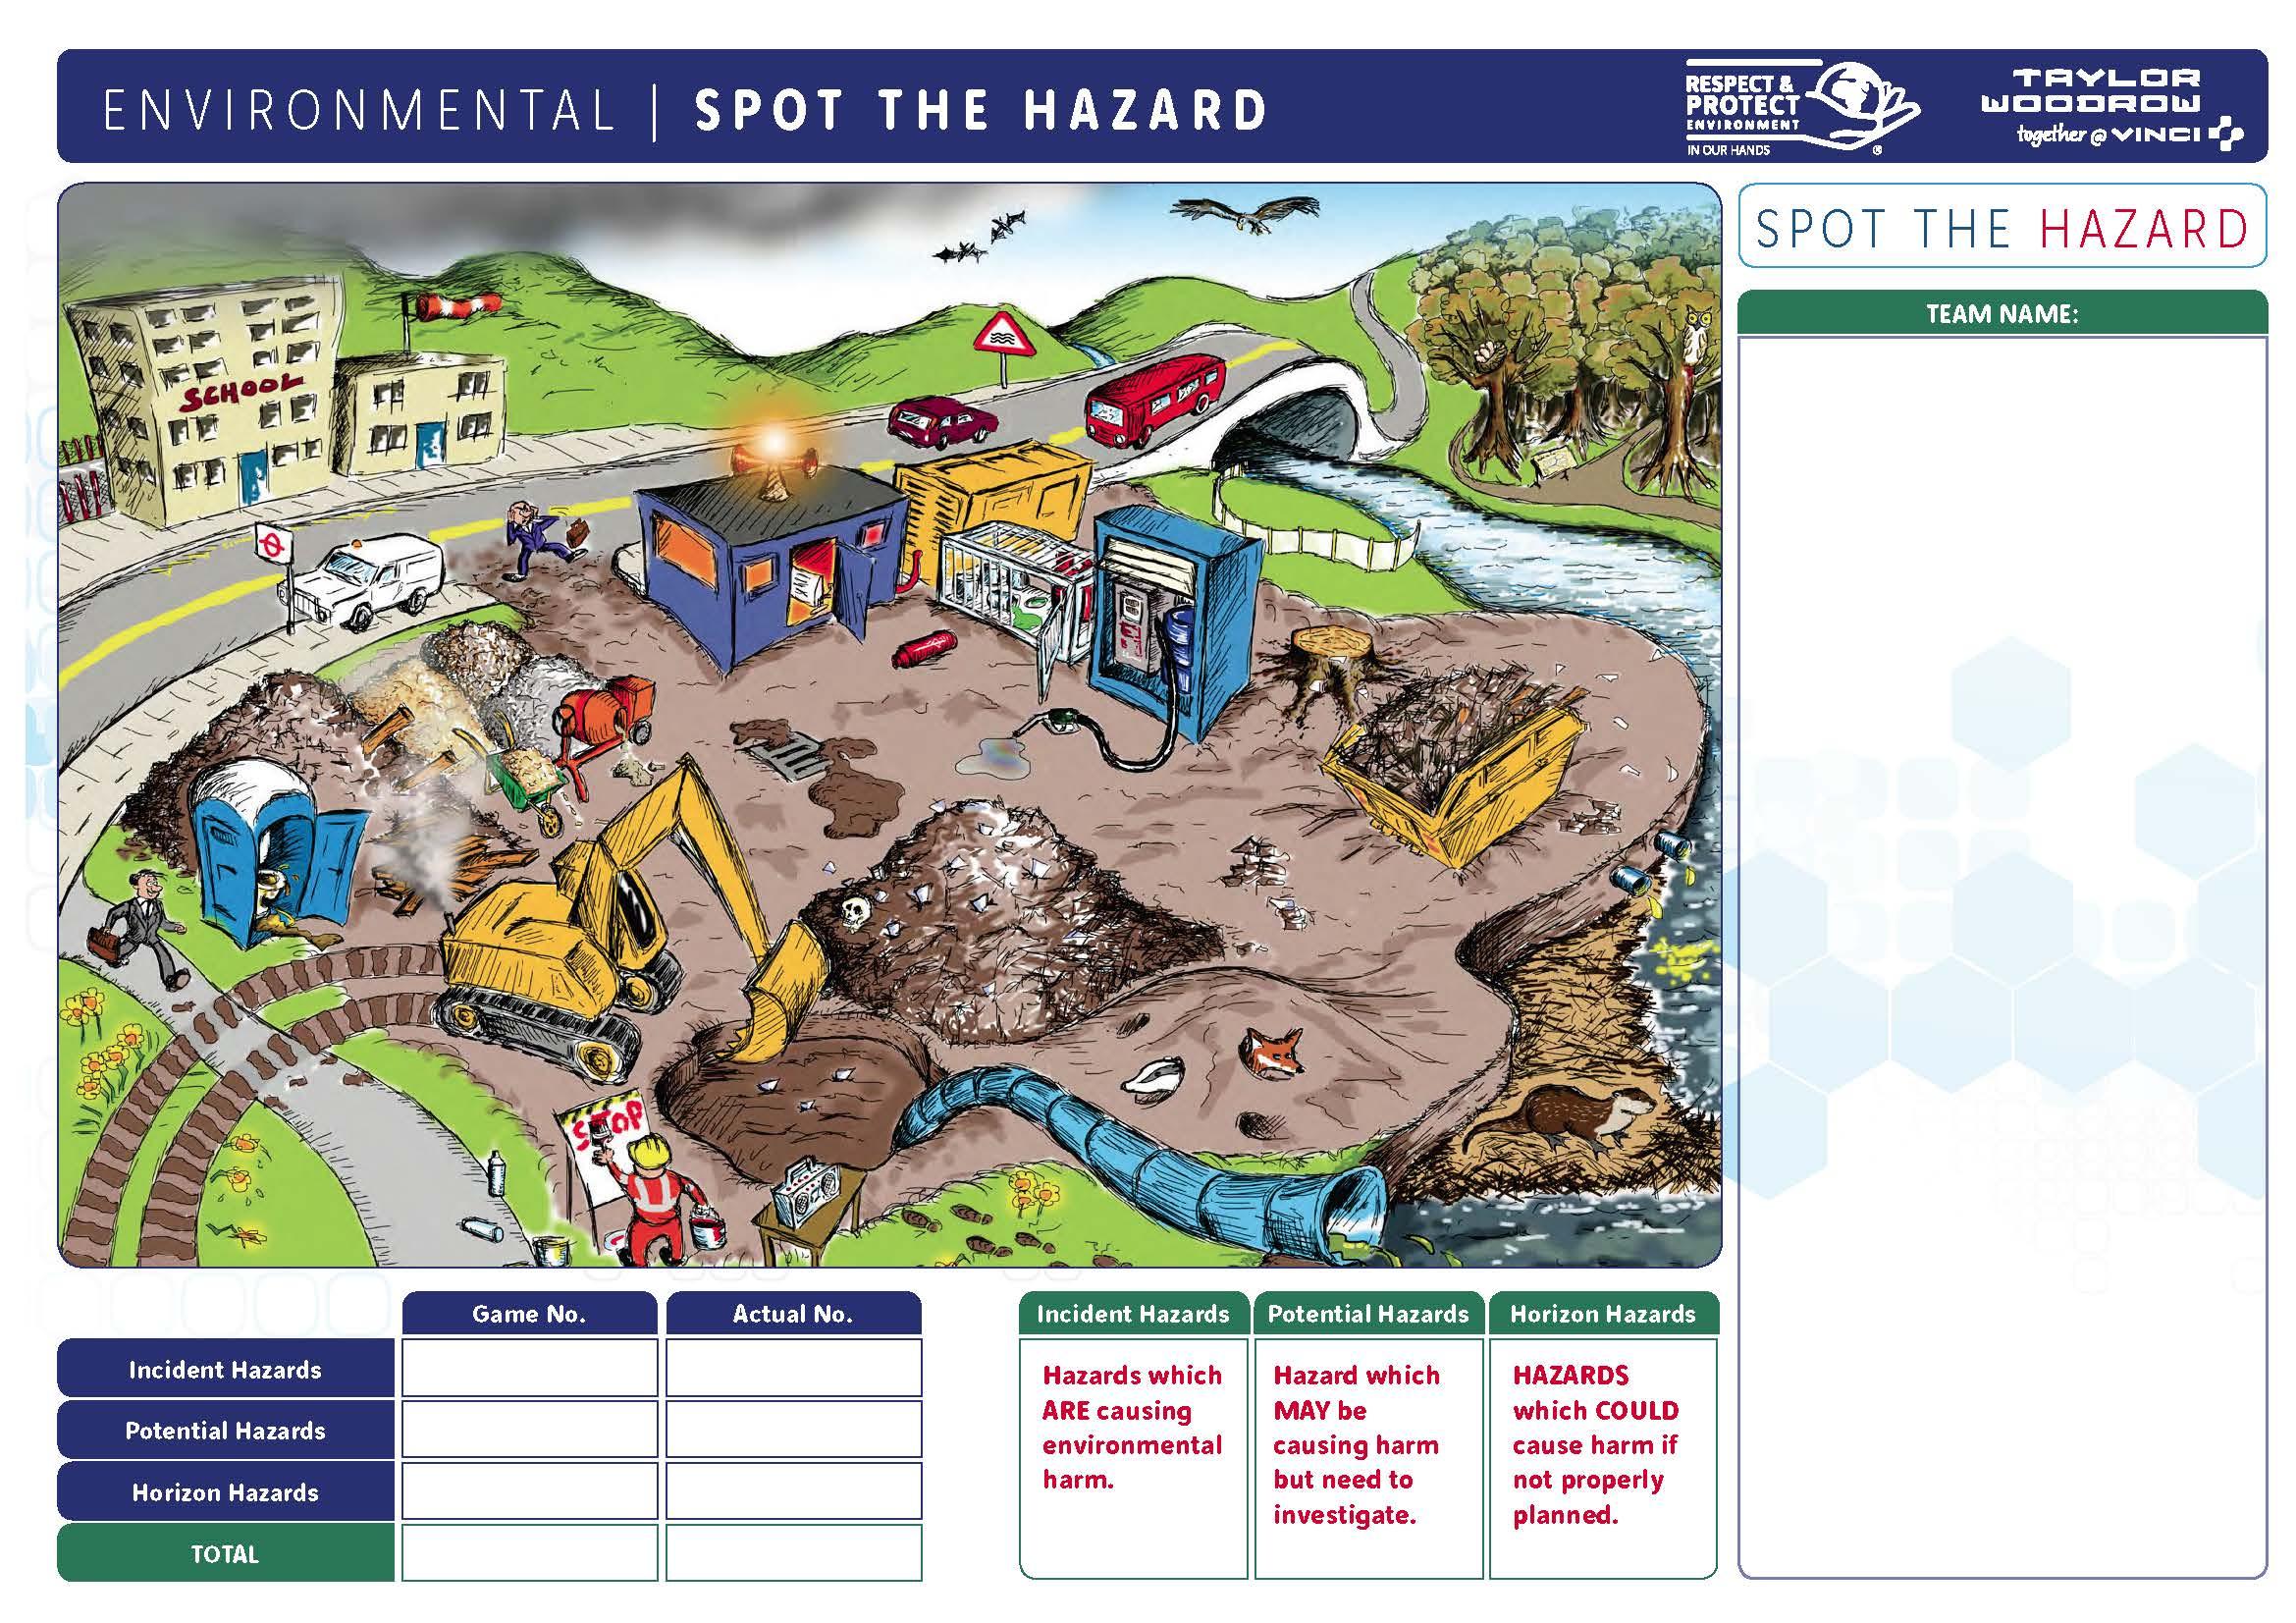 A Game For Improving Environmental Hazard Spotting Best